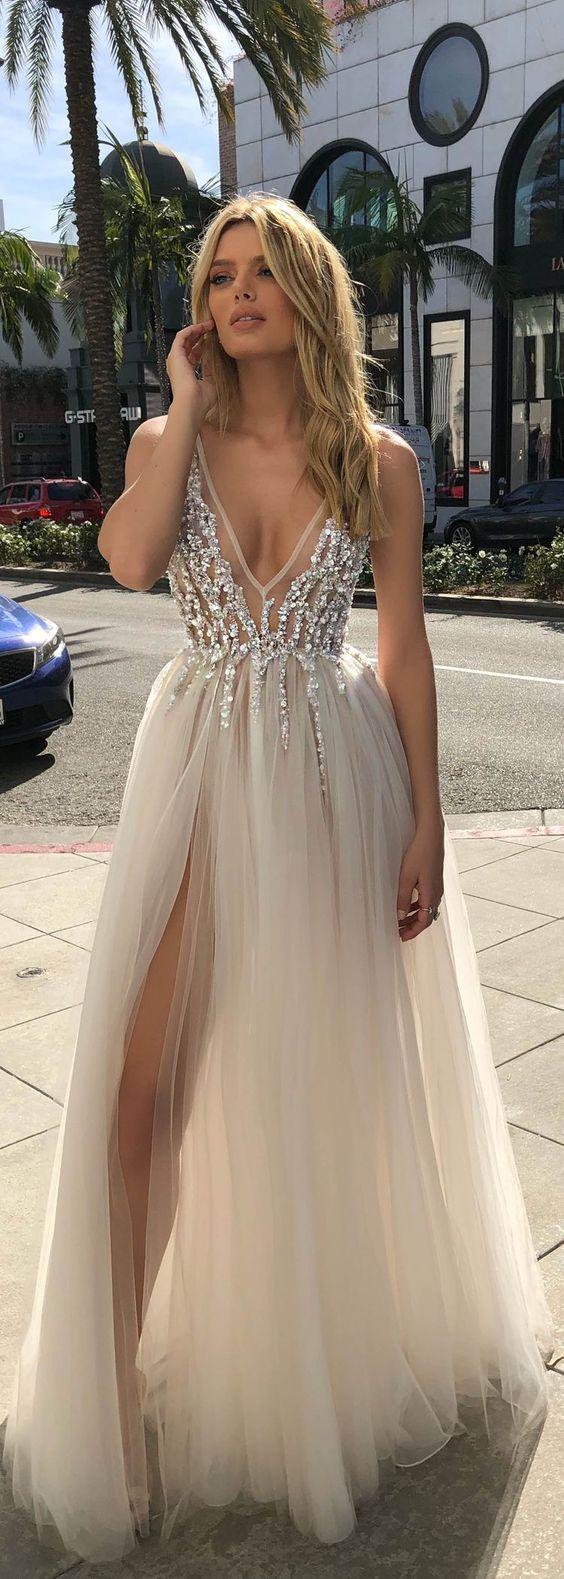 Aline deep vneck backless split sweep train grey prom dress with